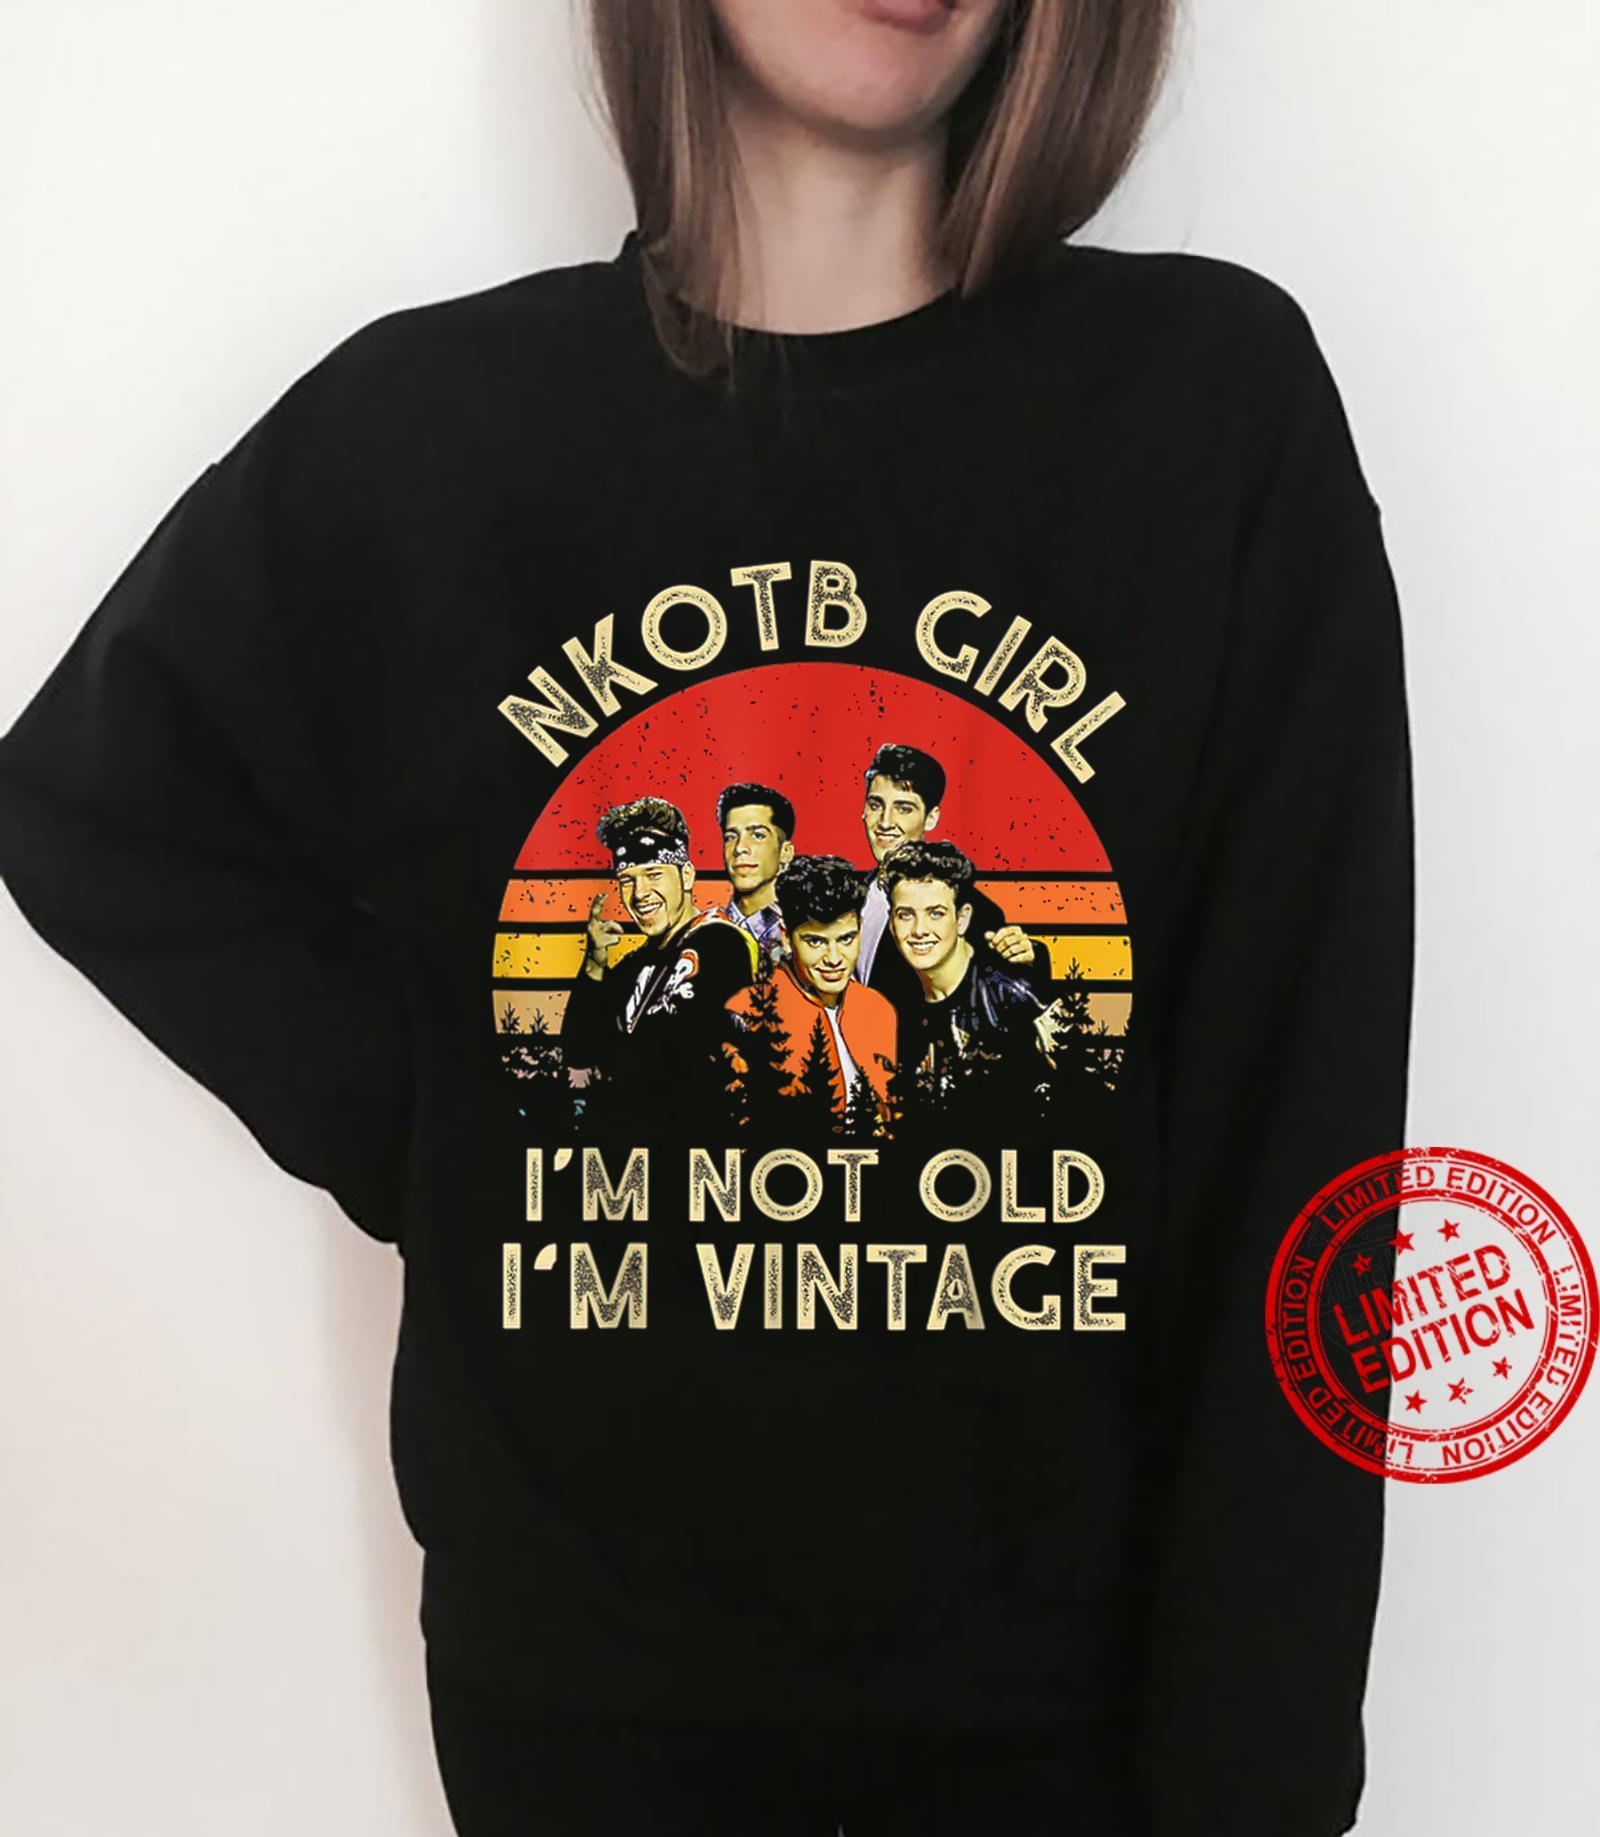 NKOTBsNew Girl I'm Not Old I'm Vintage Shirt sweater